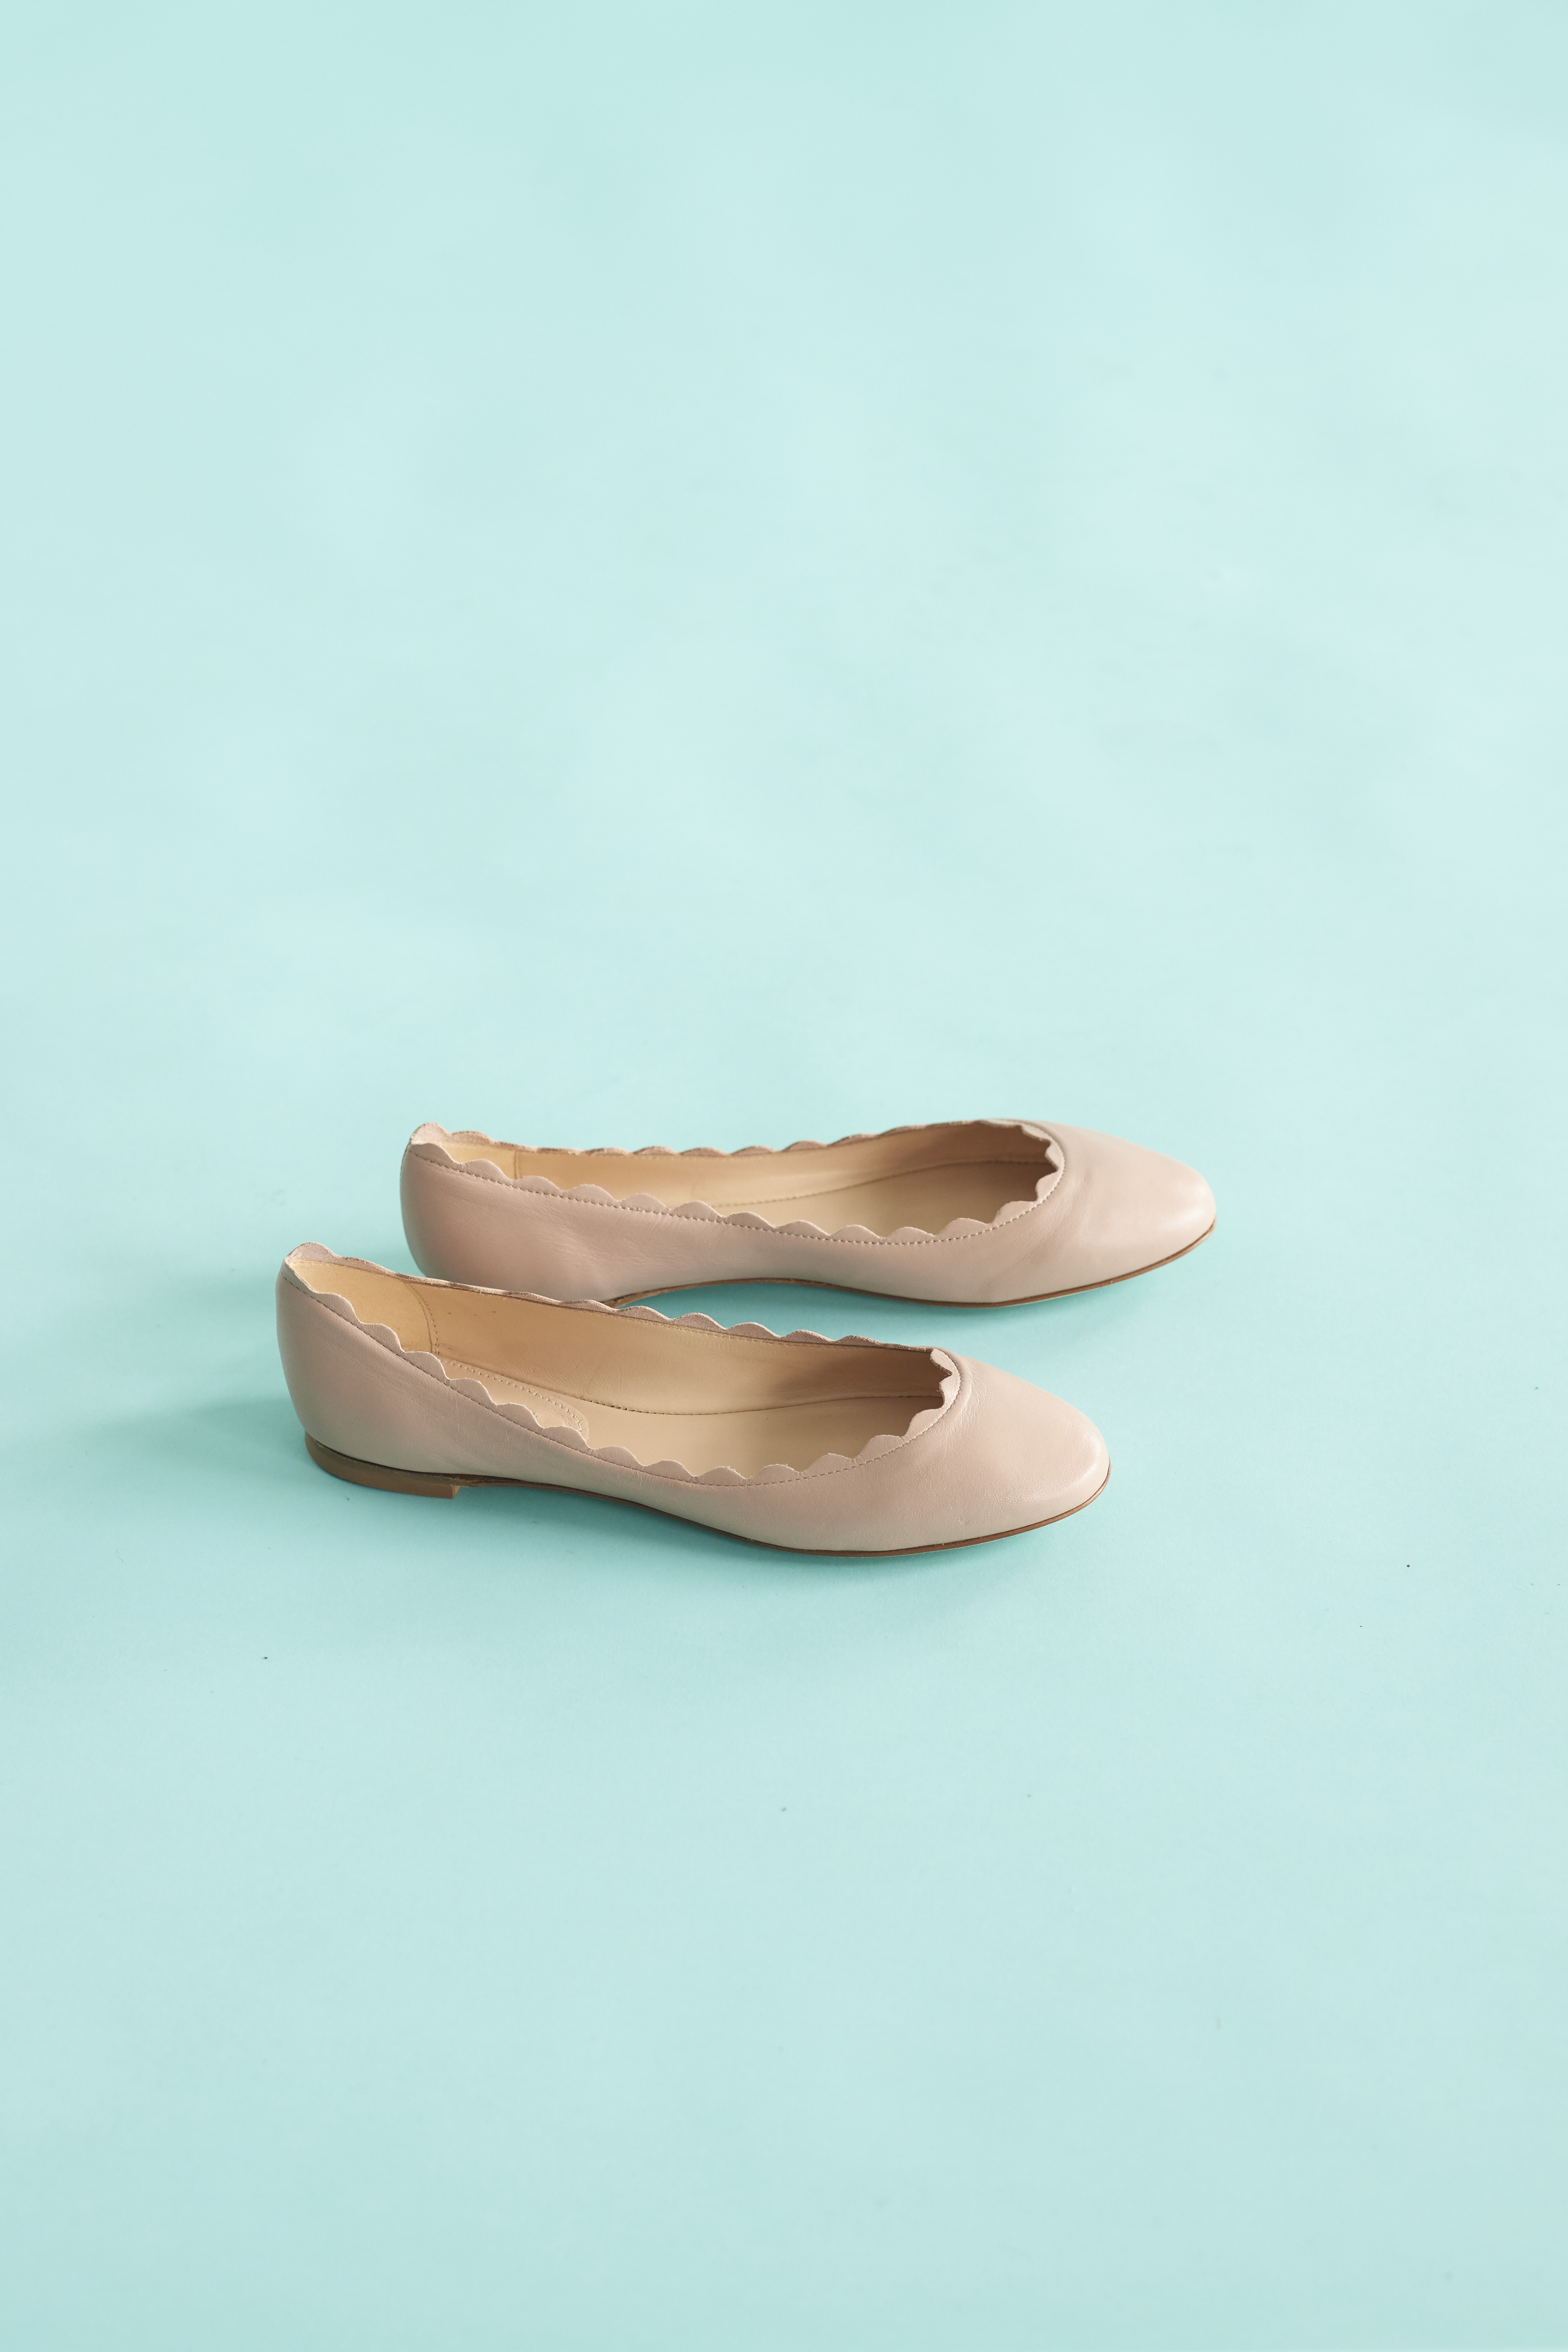 FABIO RUSCONI flat shoes